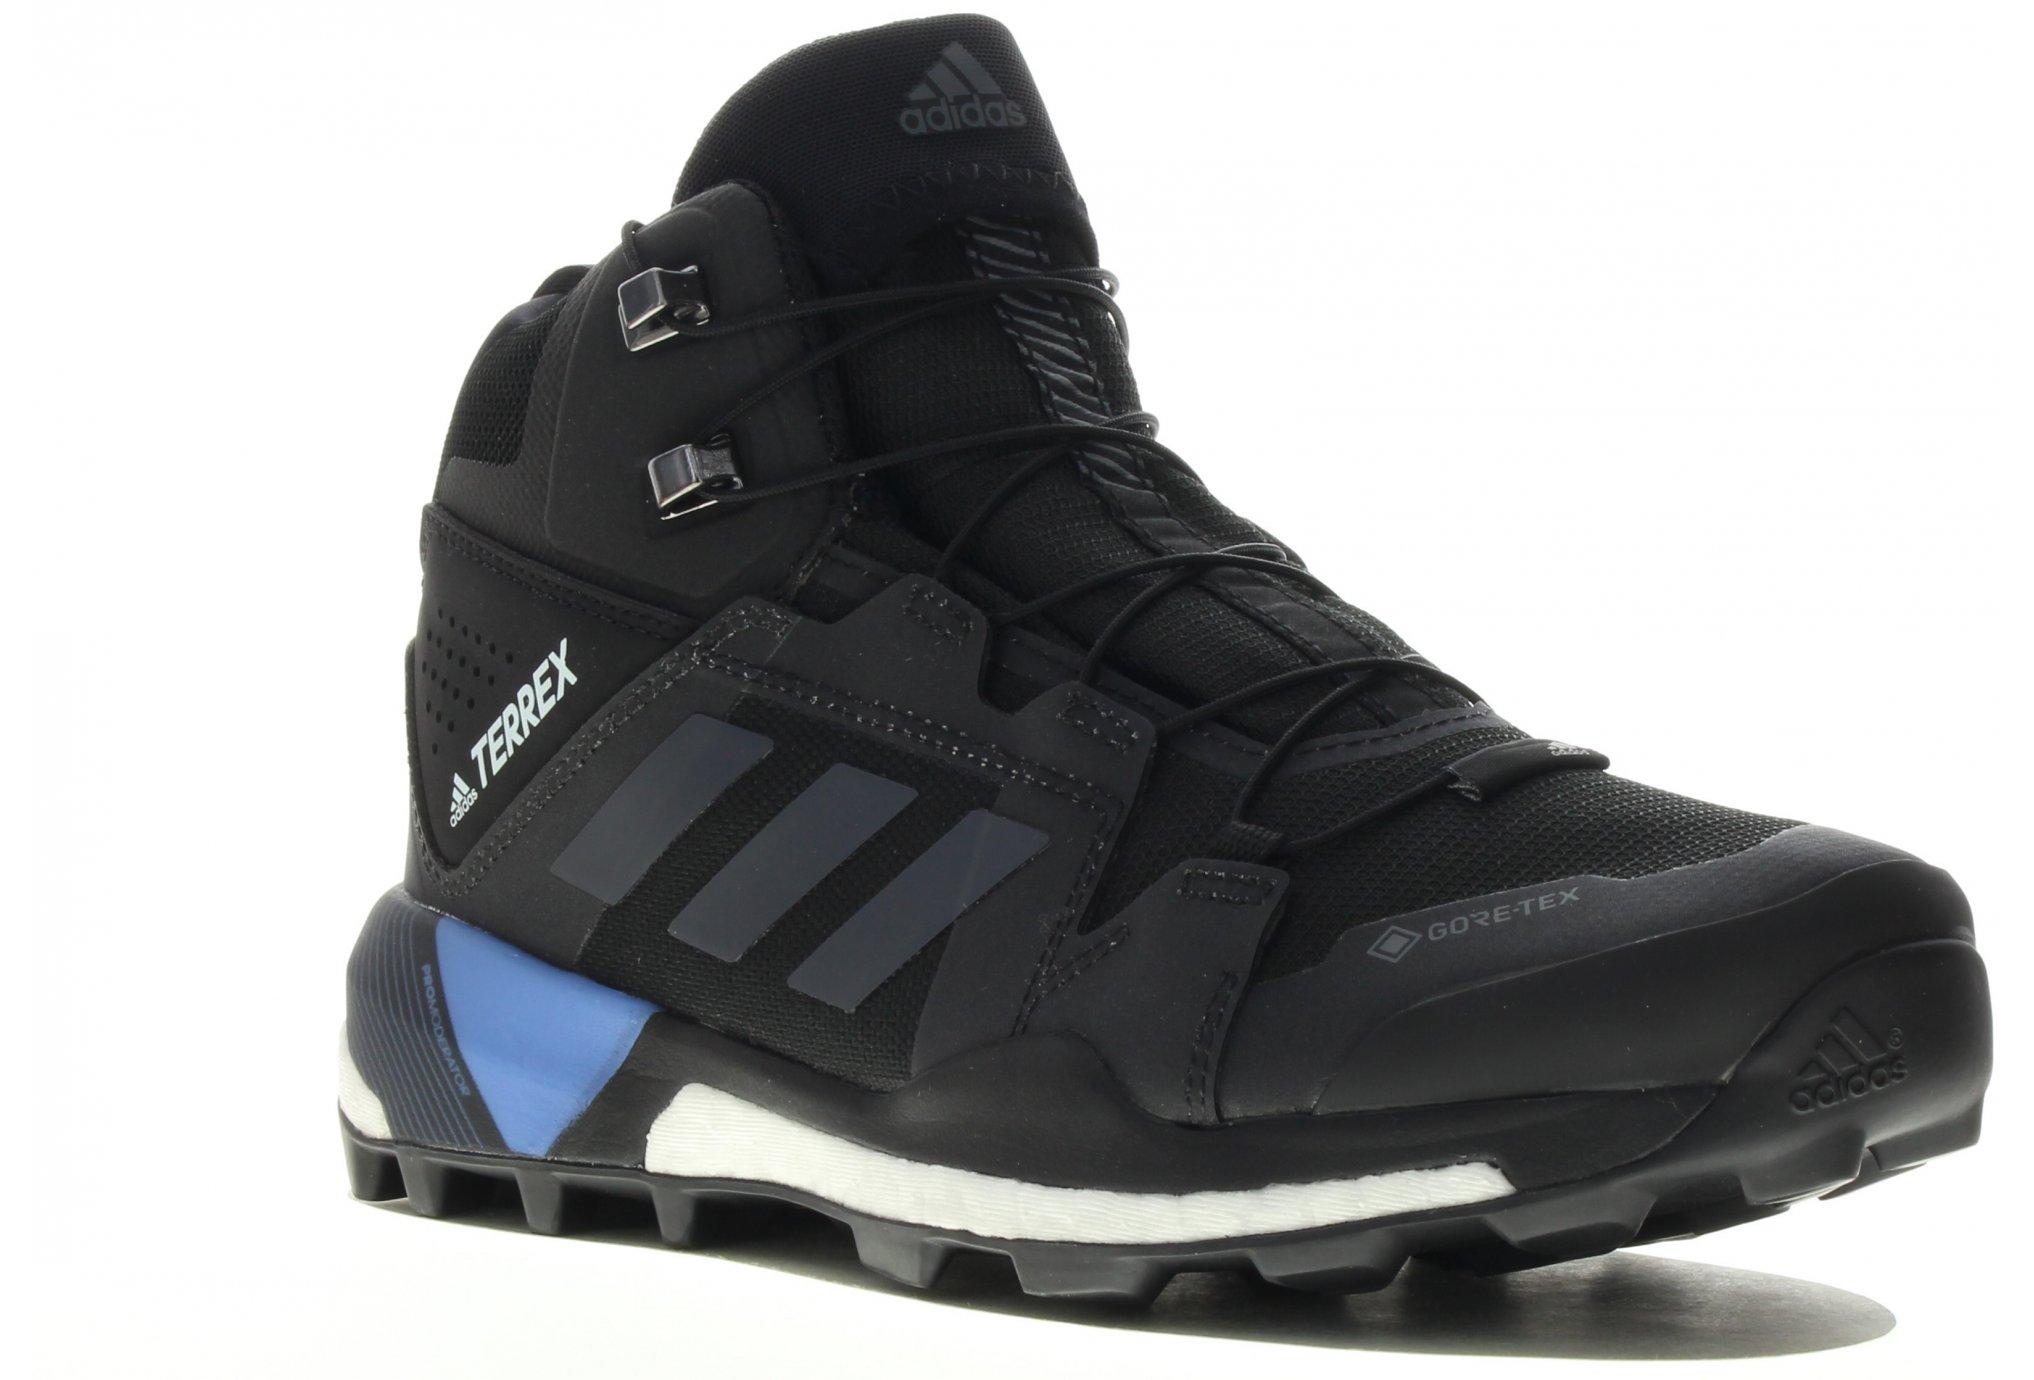 adidas Terrex Skychaser XT Mid Gore-Tex W Diététique Chaussures femme